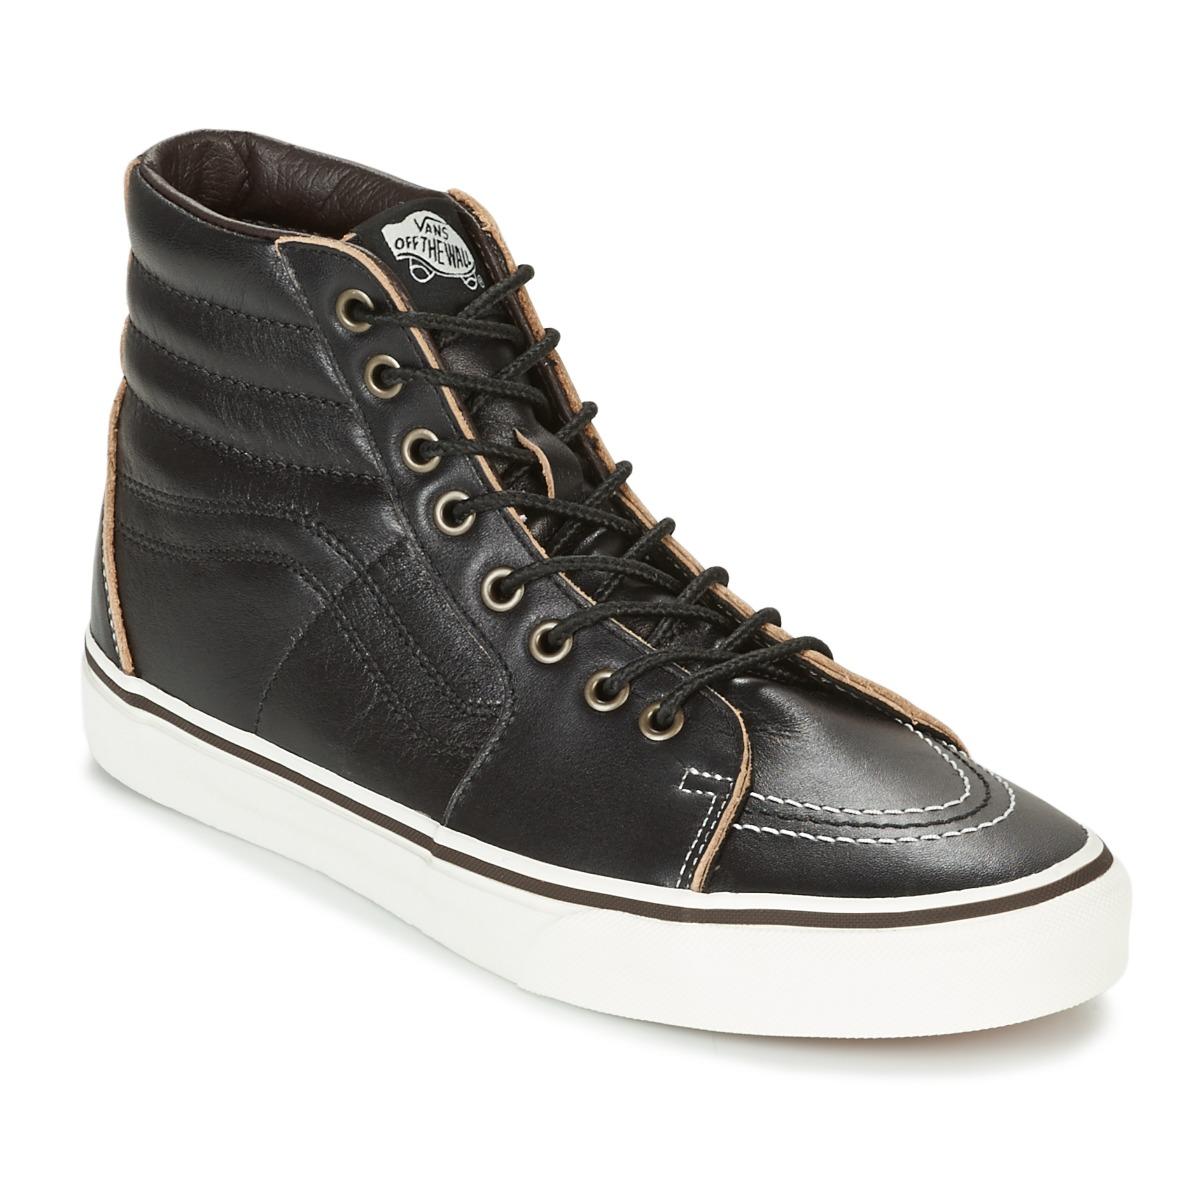 Vans SK8-HI Schwarz - Kostenloser Versand bei Spartoode ! - Schuhe Sneaker High  76,30 €